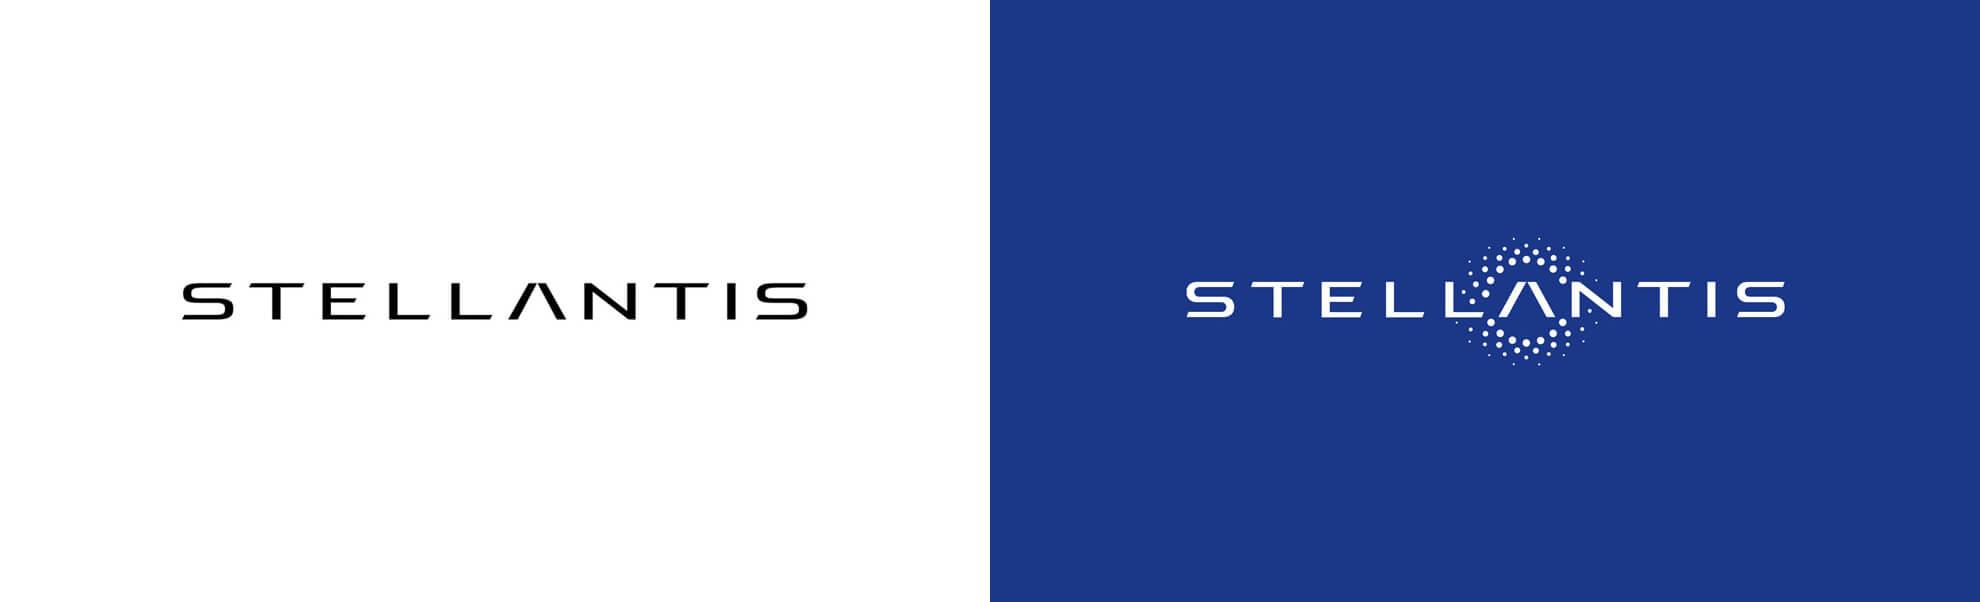 Koncern Stellantis ma nowy znak